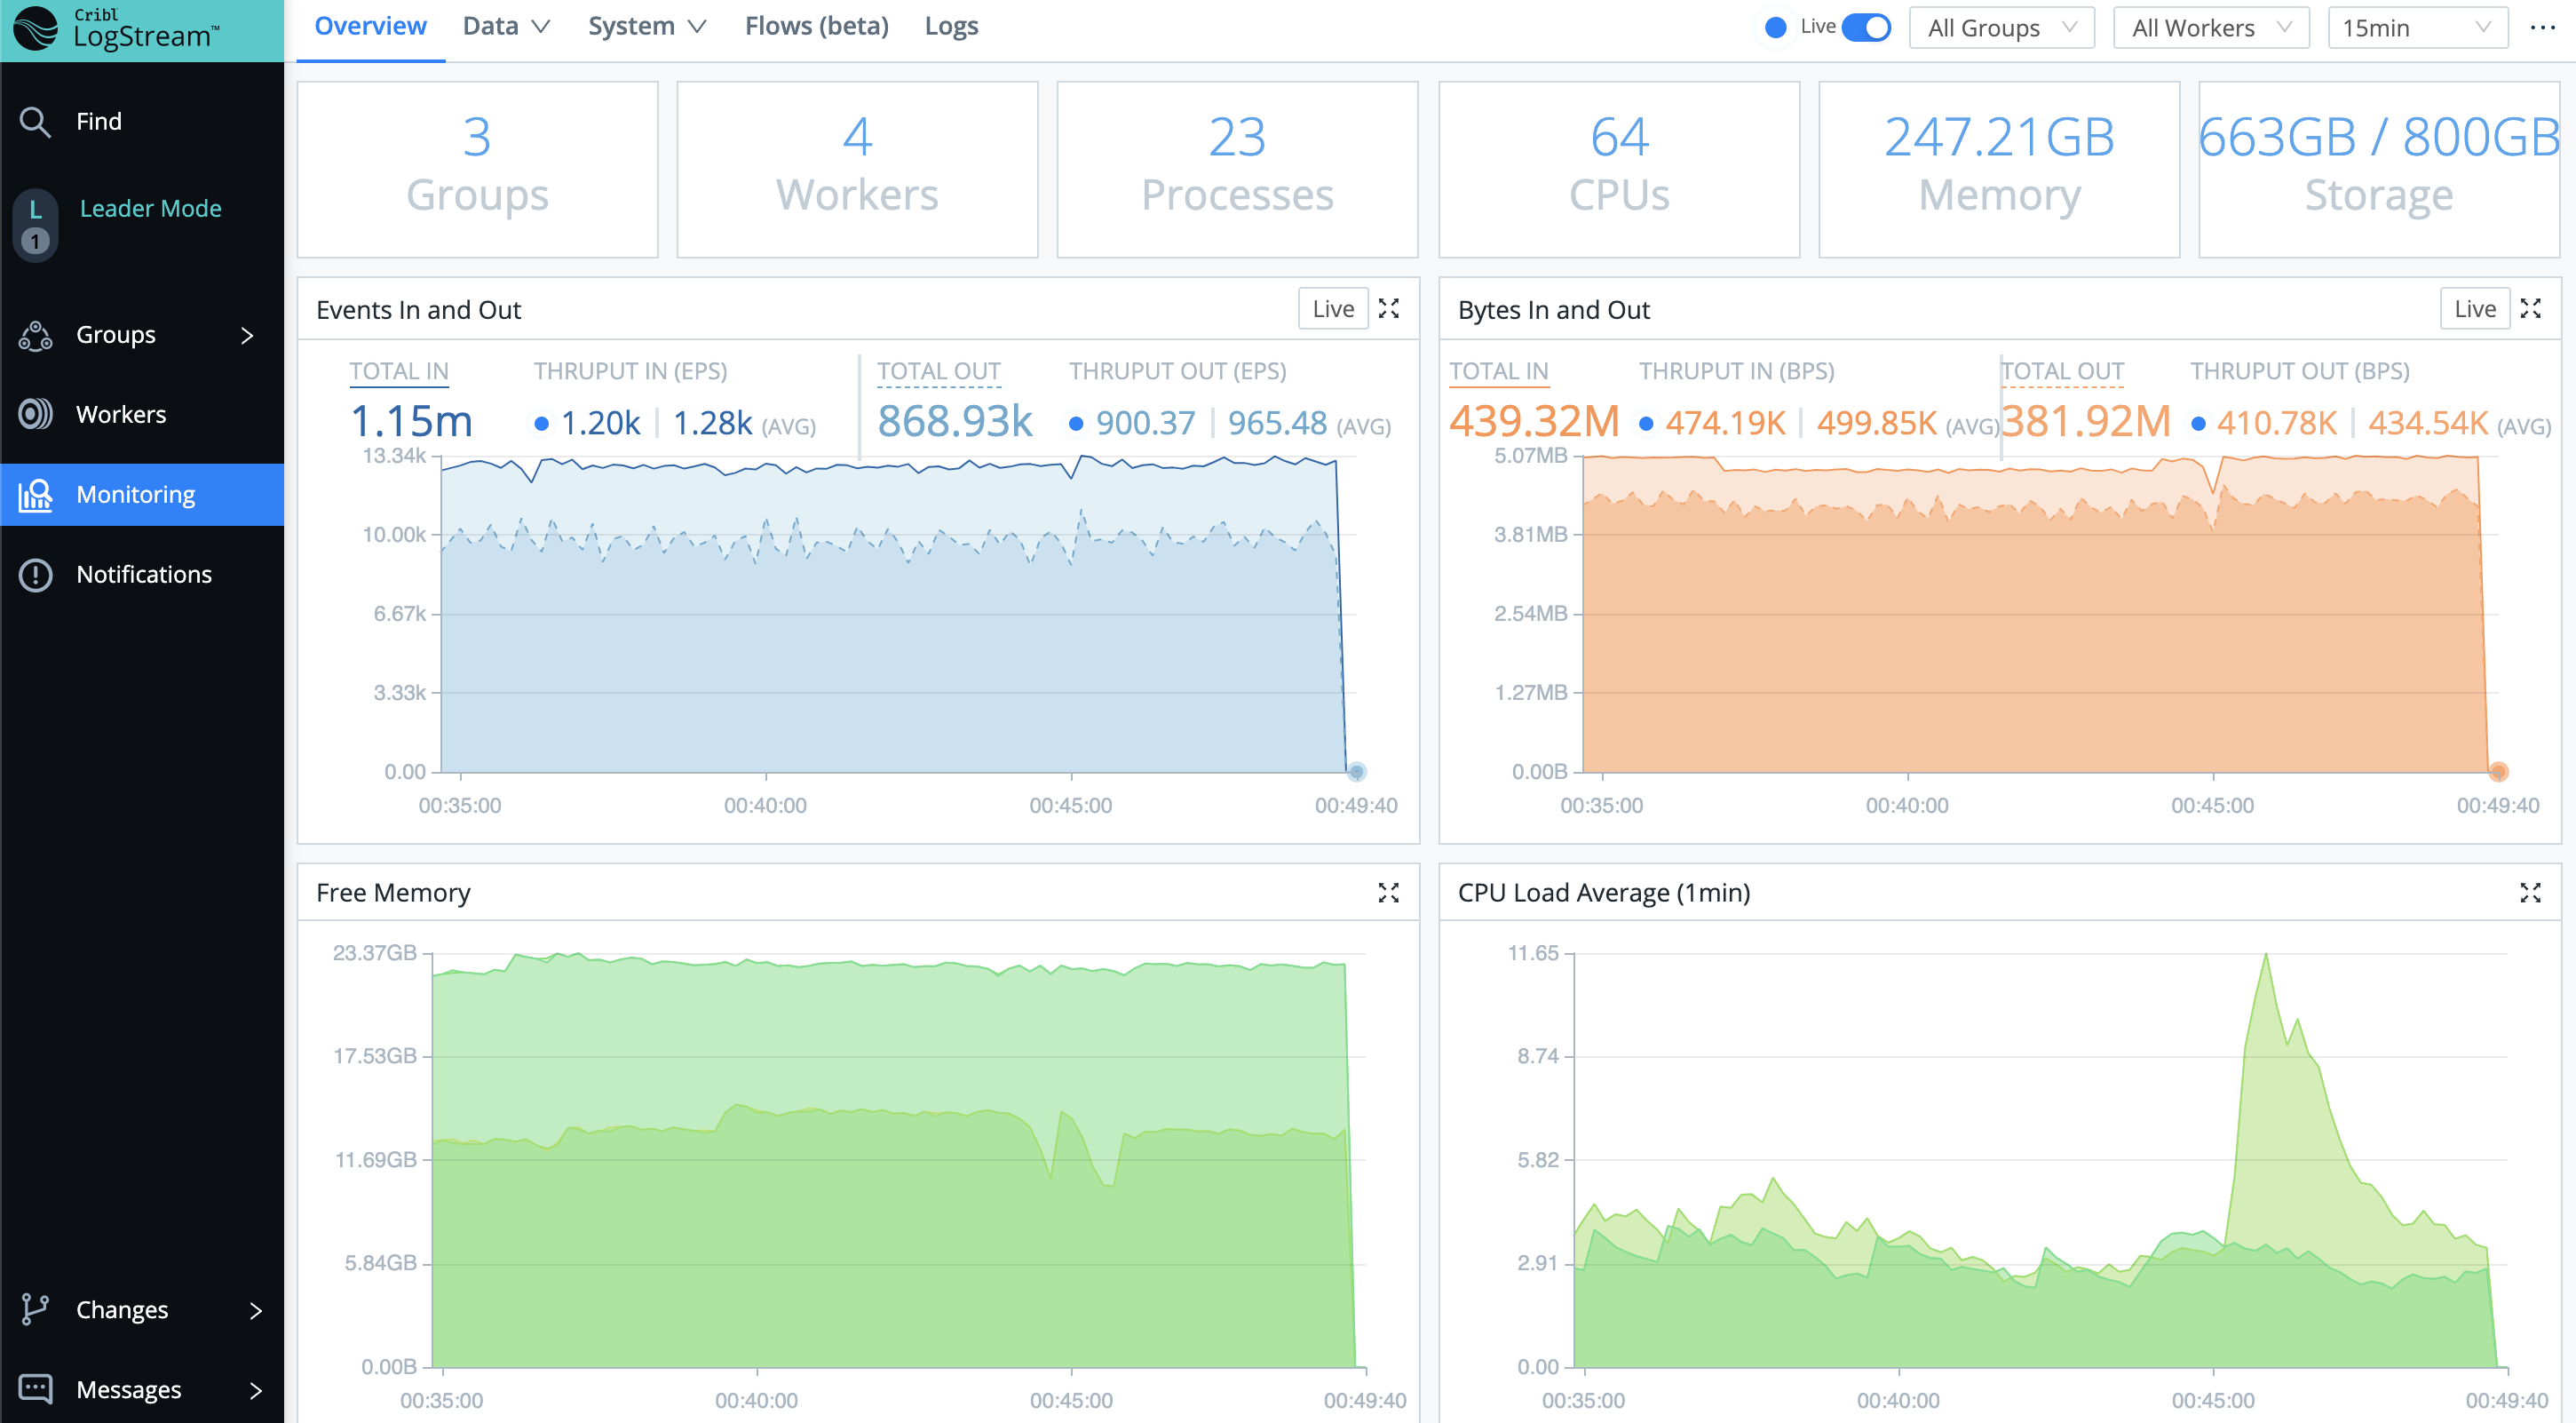 Monitoring page